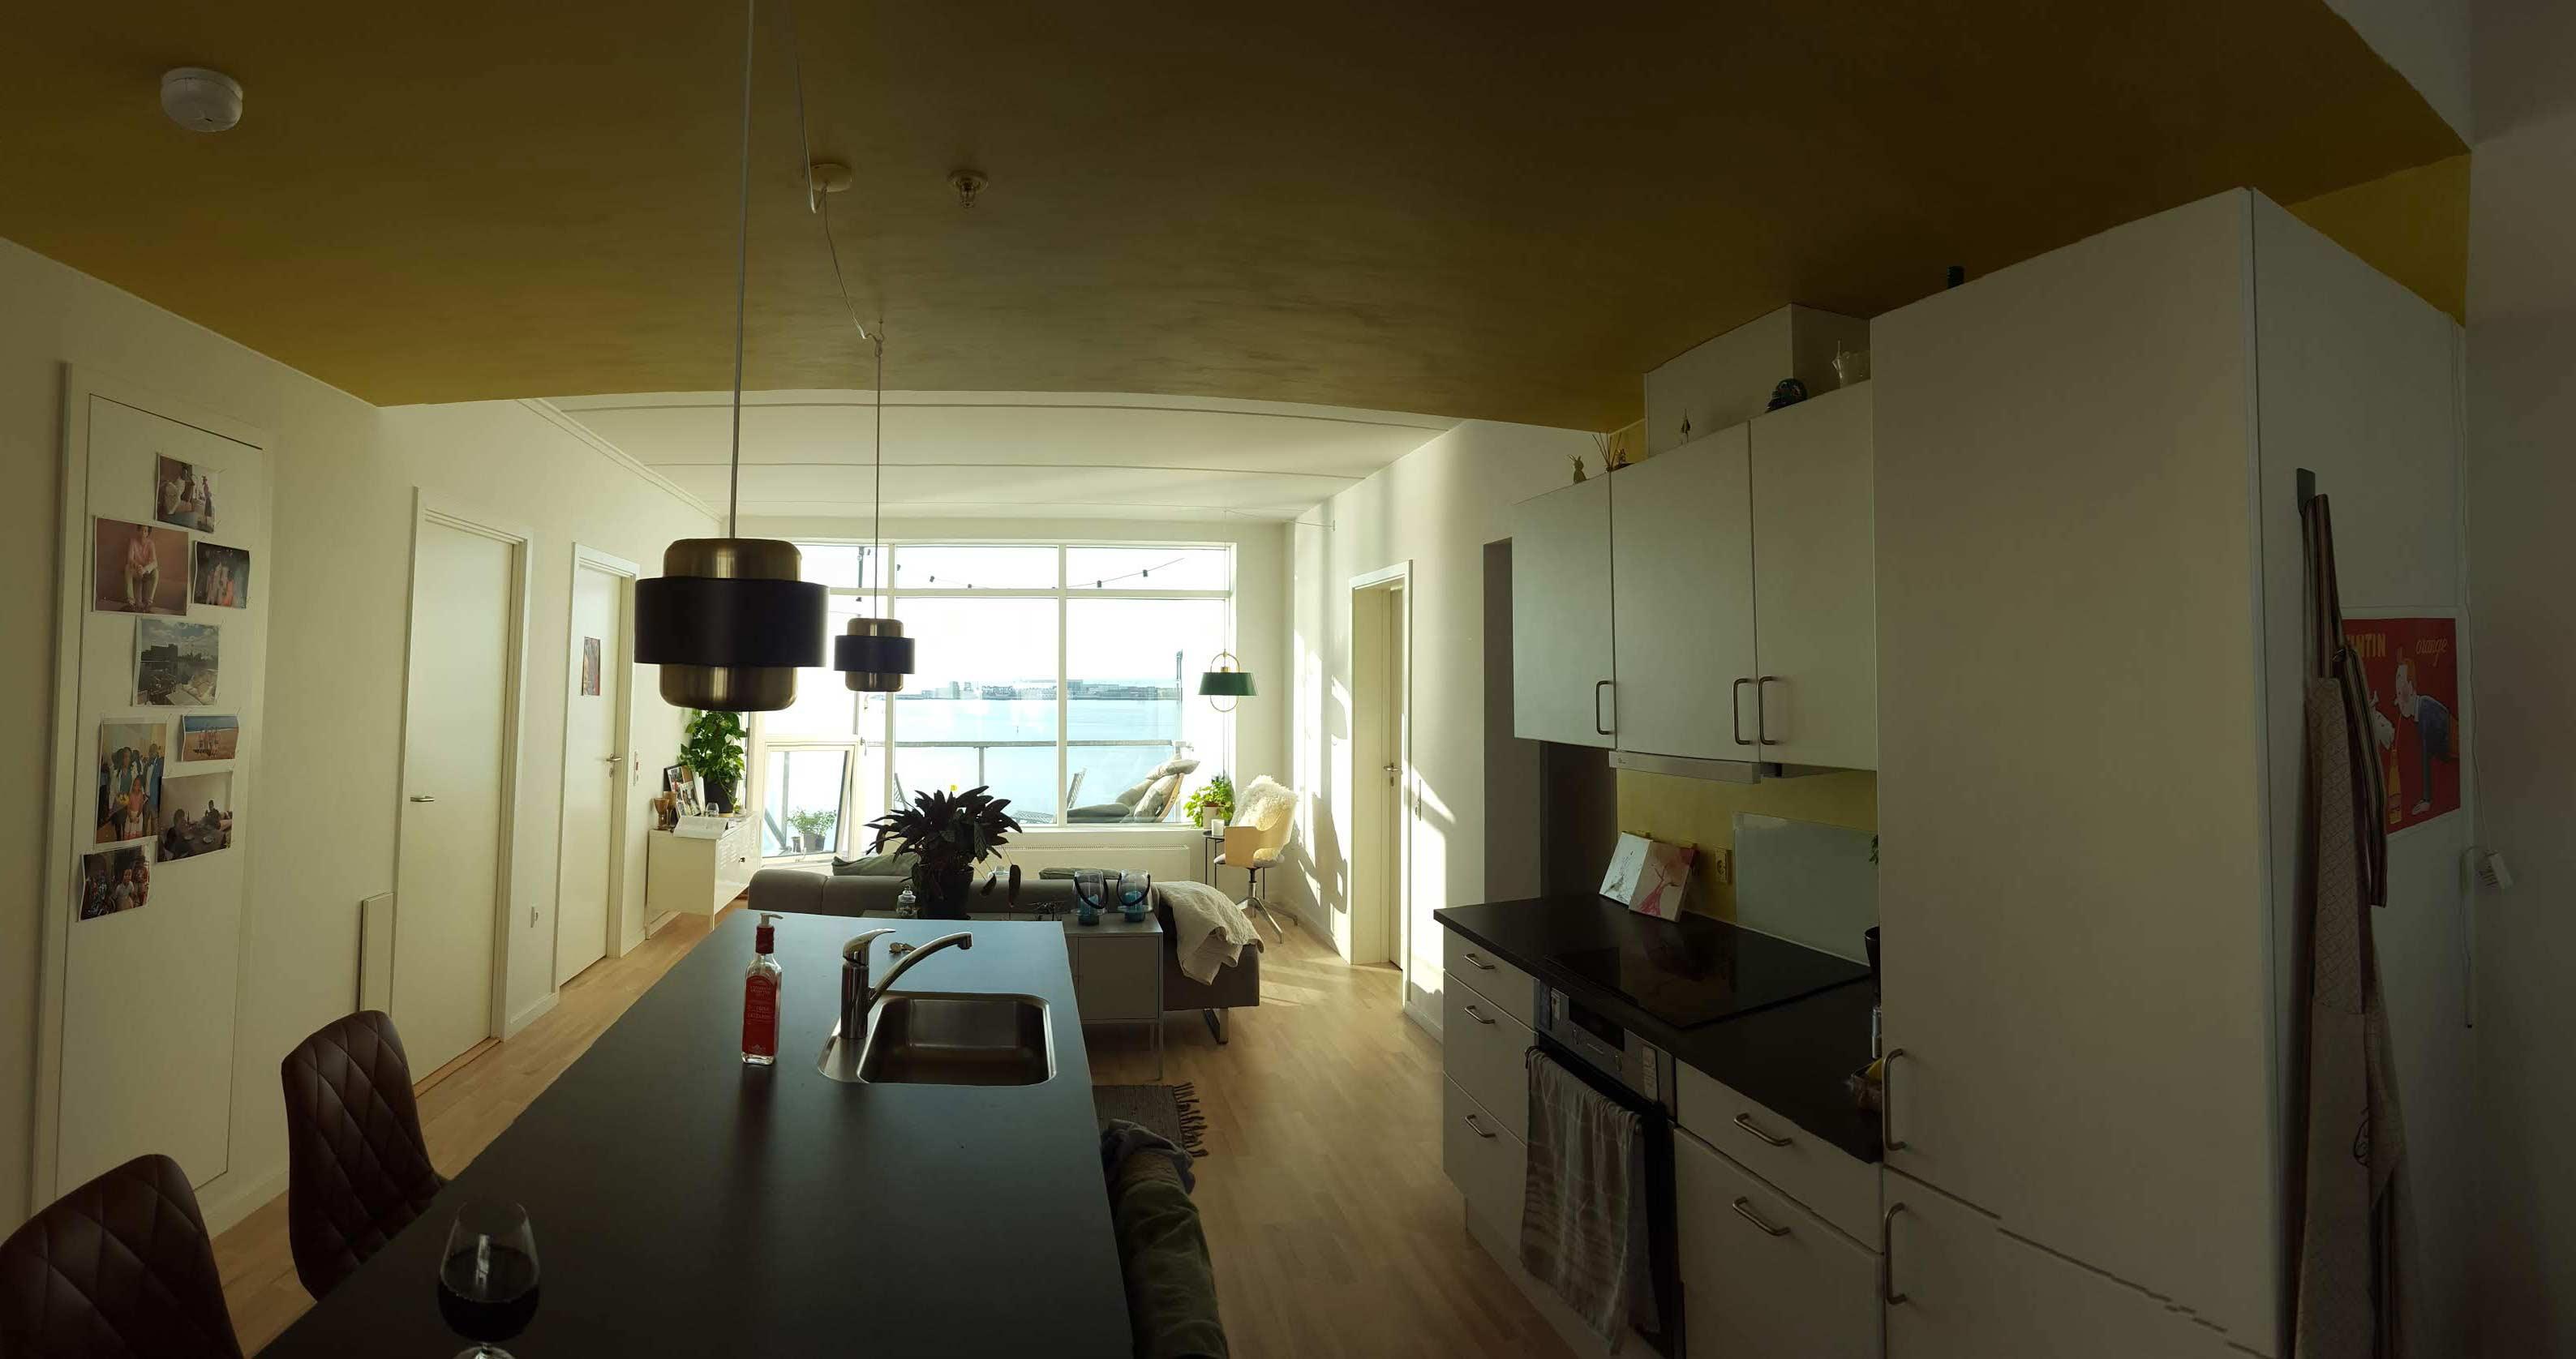 Modern housing association in Aarhus Ø is looking for quiet tenants